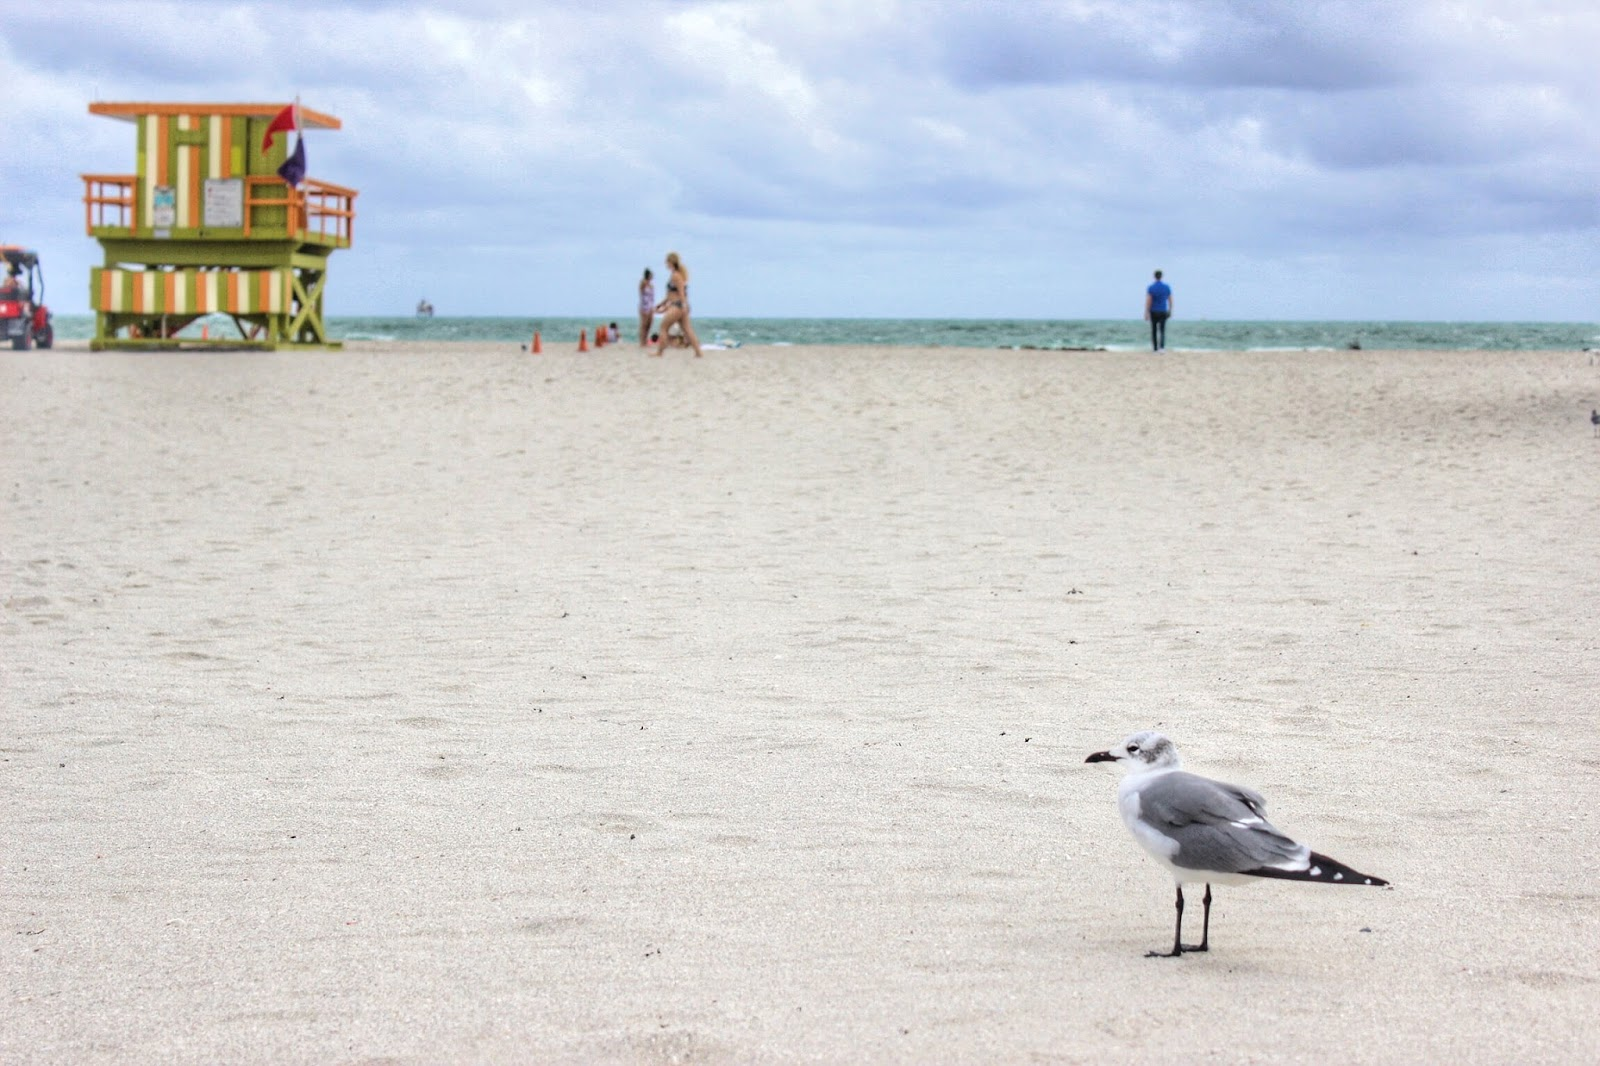 lifesthayle-miami-photodiary-south-beach-bird.jpg